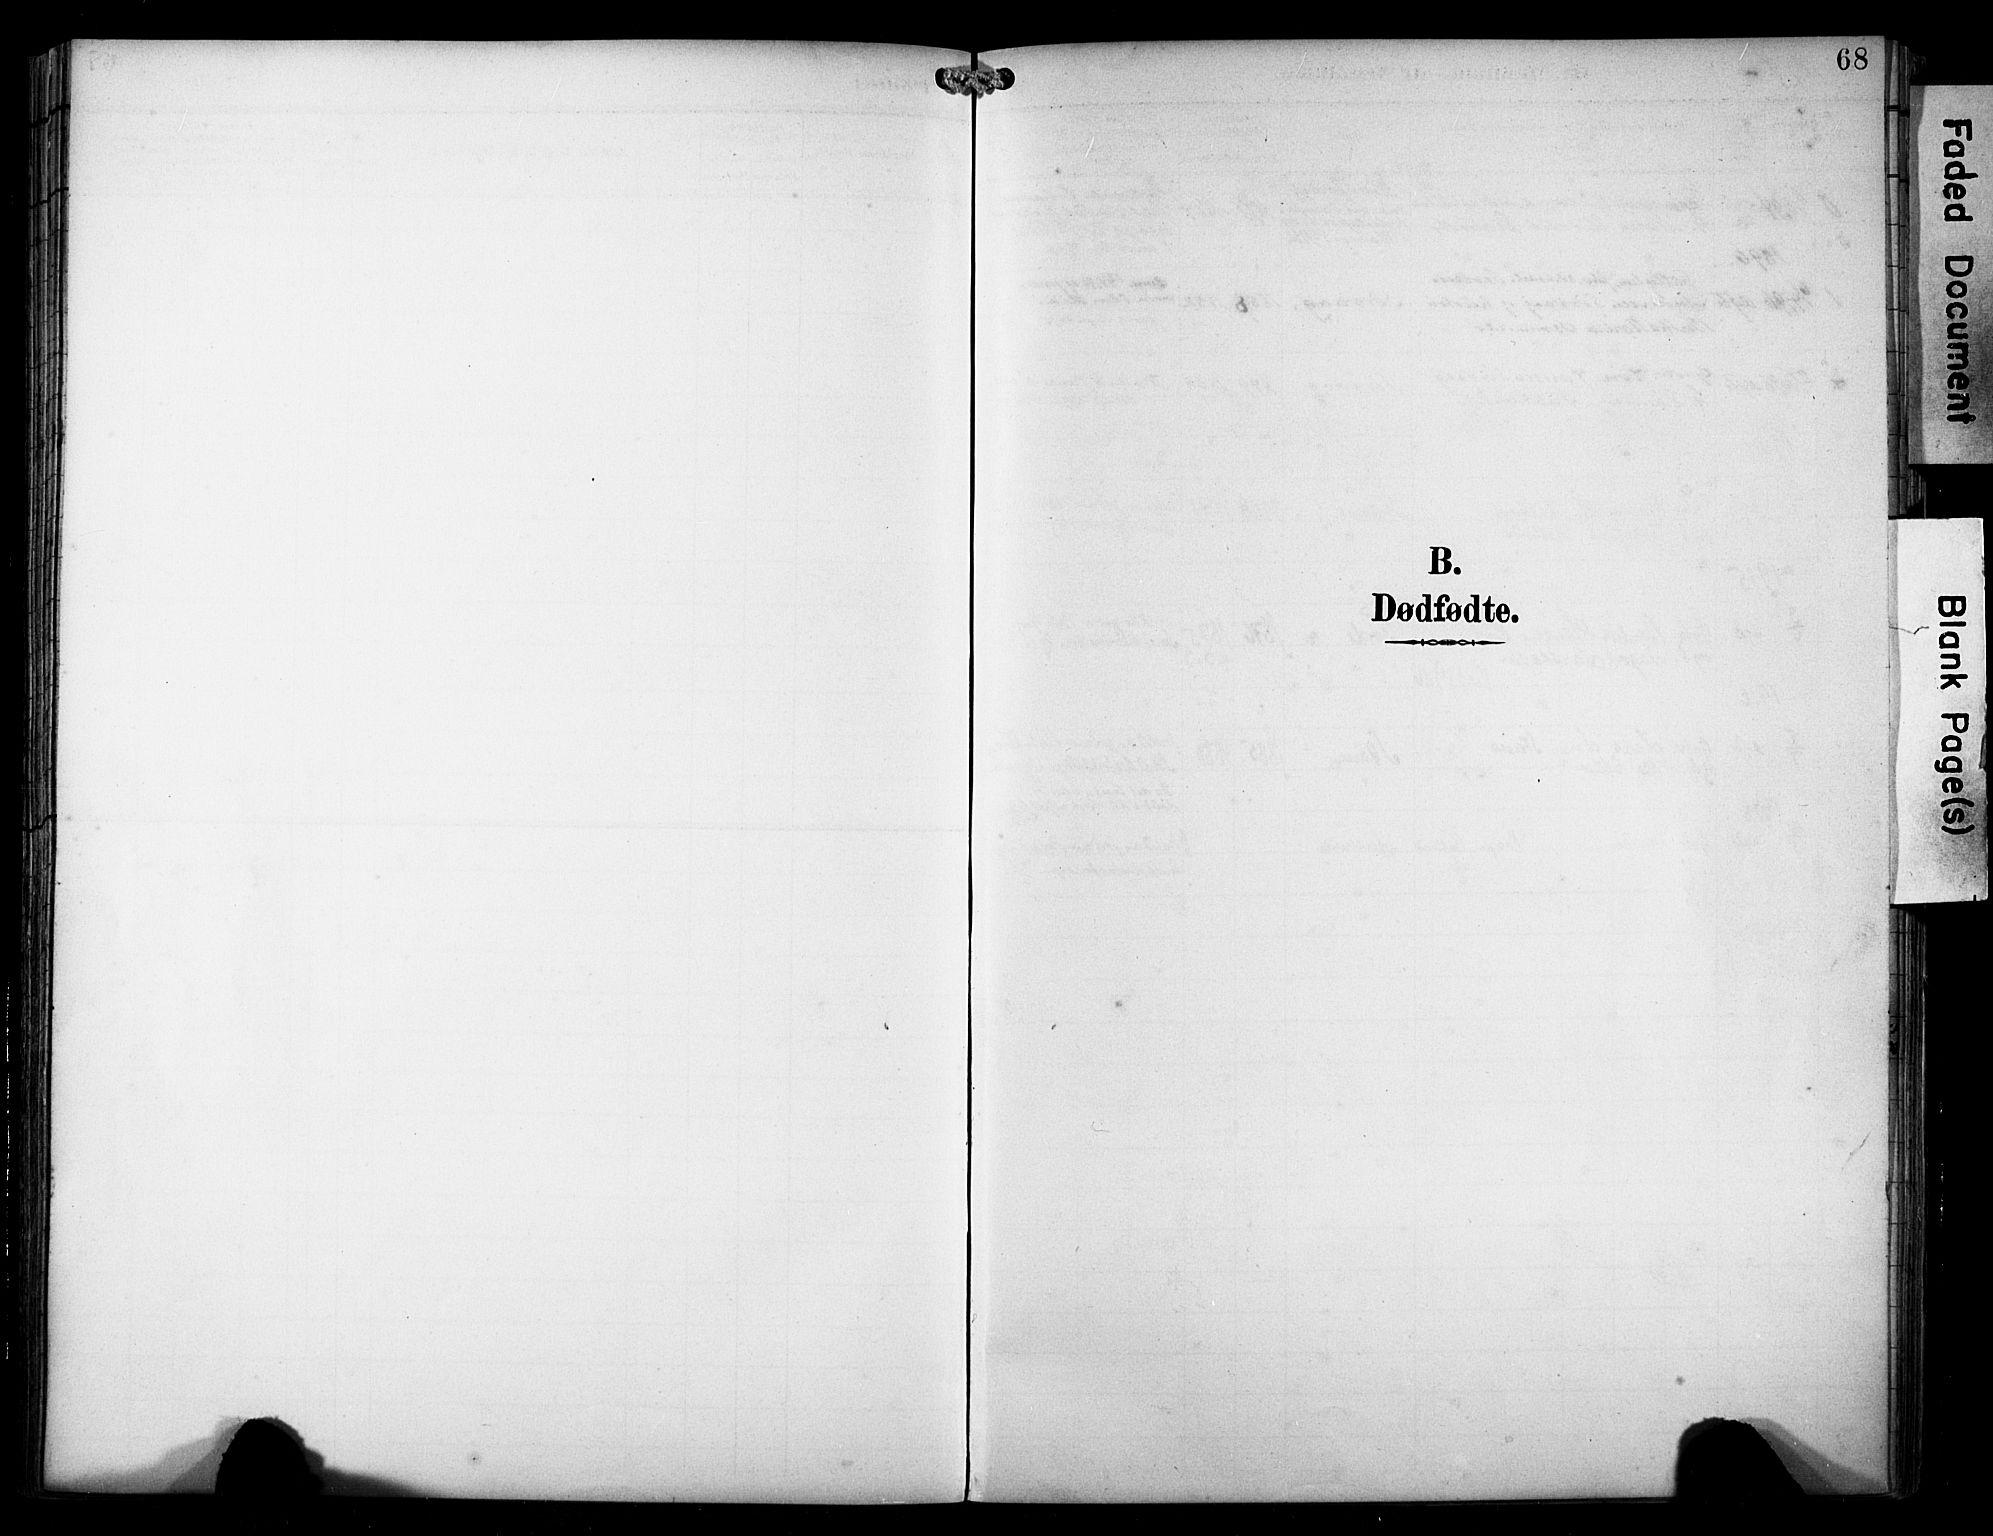 SAST, Avaldsnes sokneprestkontor, H/Ha/Haa/L0016: Ministerialbok nr. A 16, 1893-1918, s. 68